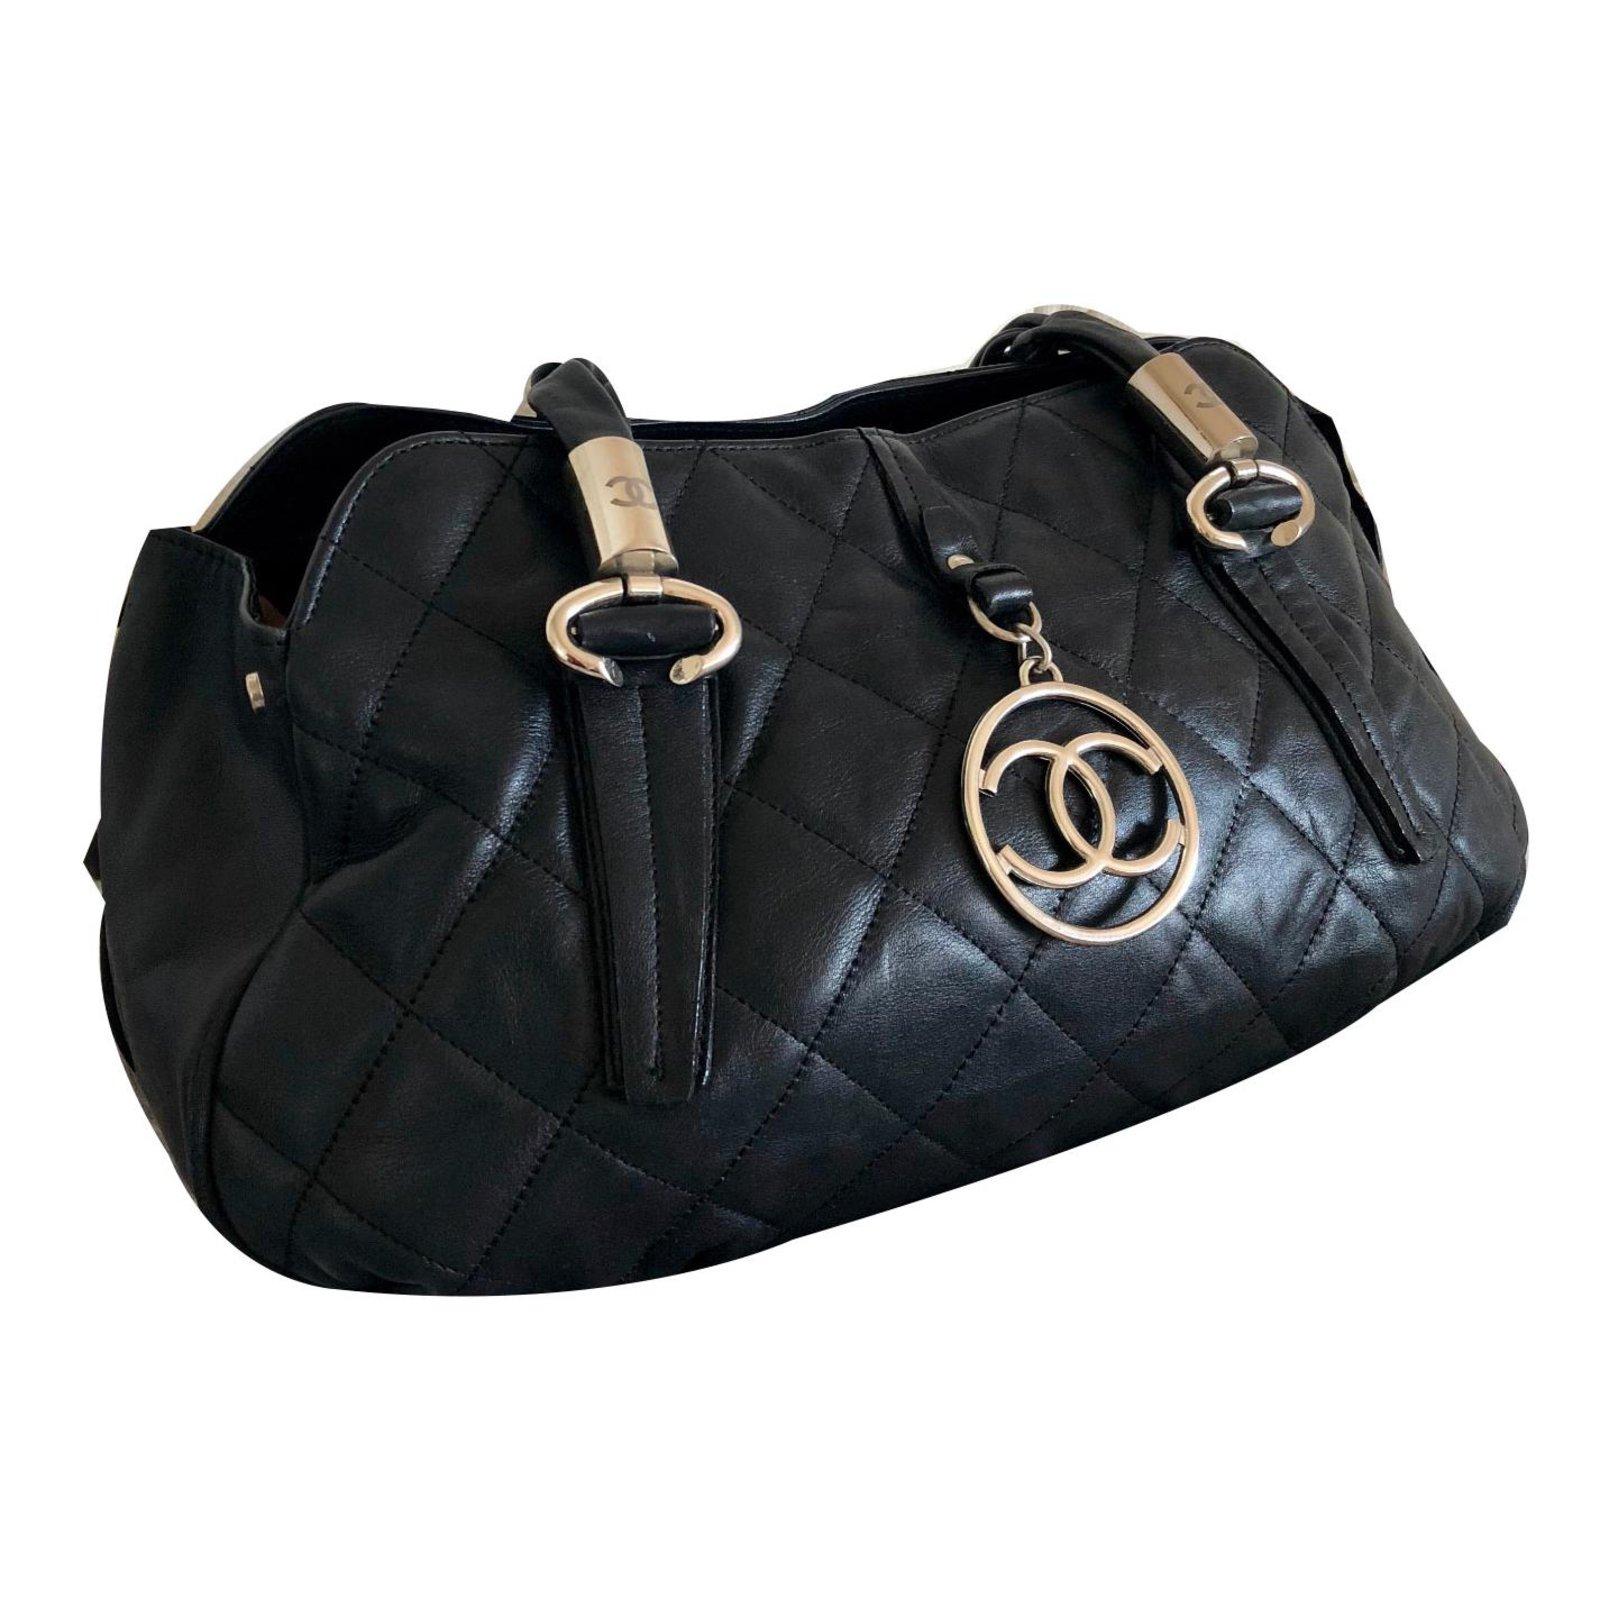 50dbce923e Sacs à main Chanel Sac à main Cuir Noir ref.72522 - Joli Closet